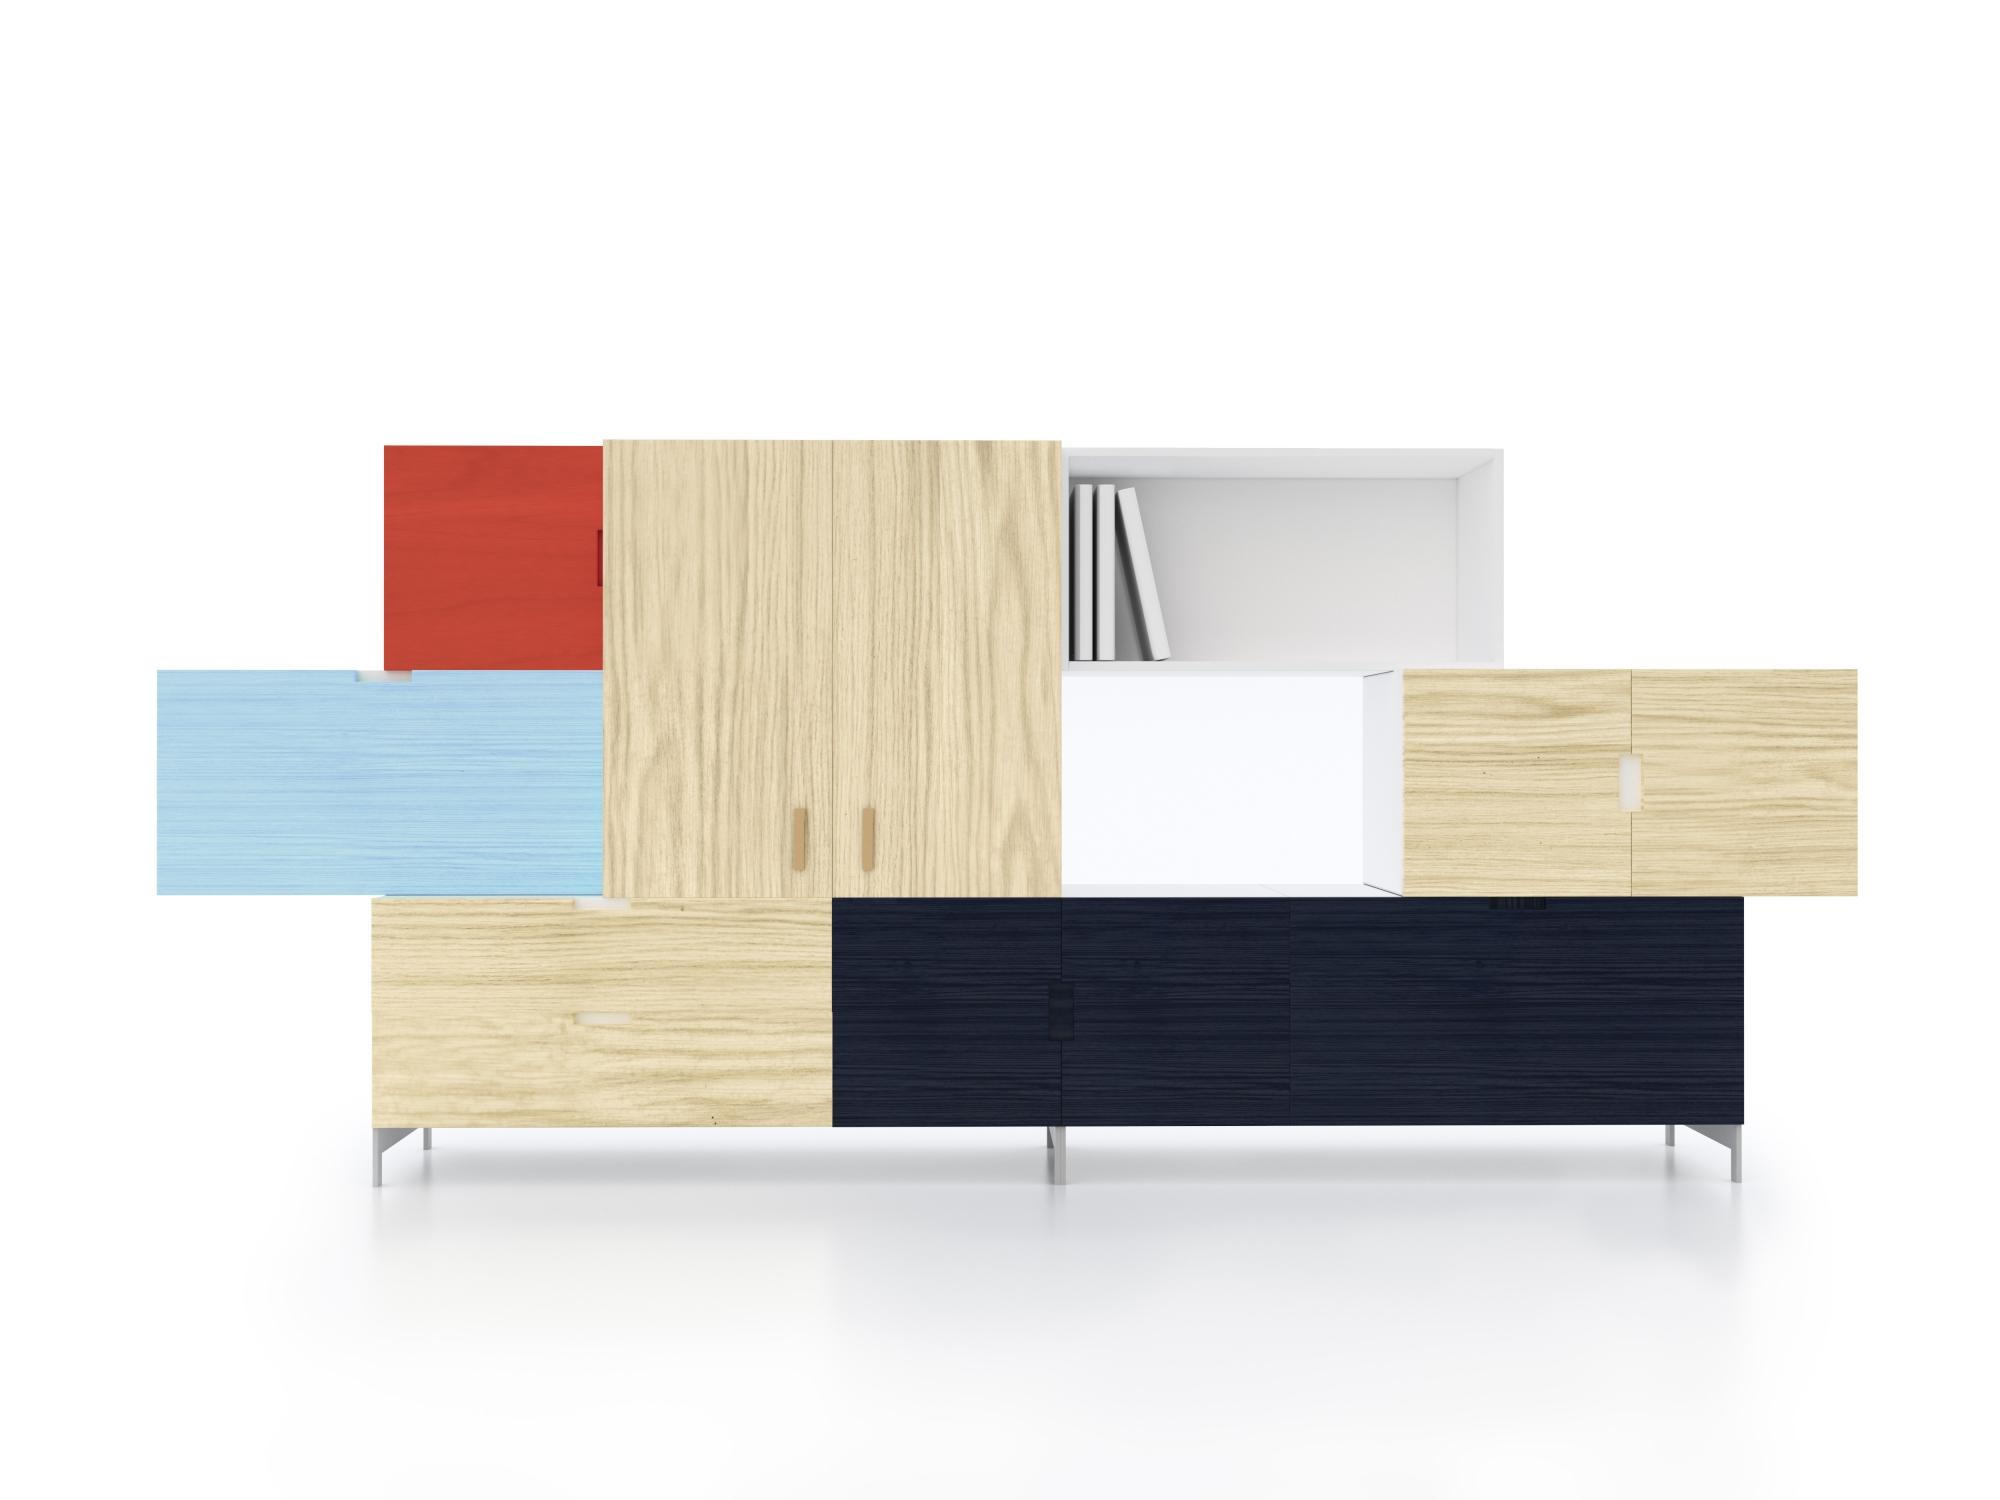 tetris furniture multifunctional furniture trio design indaba